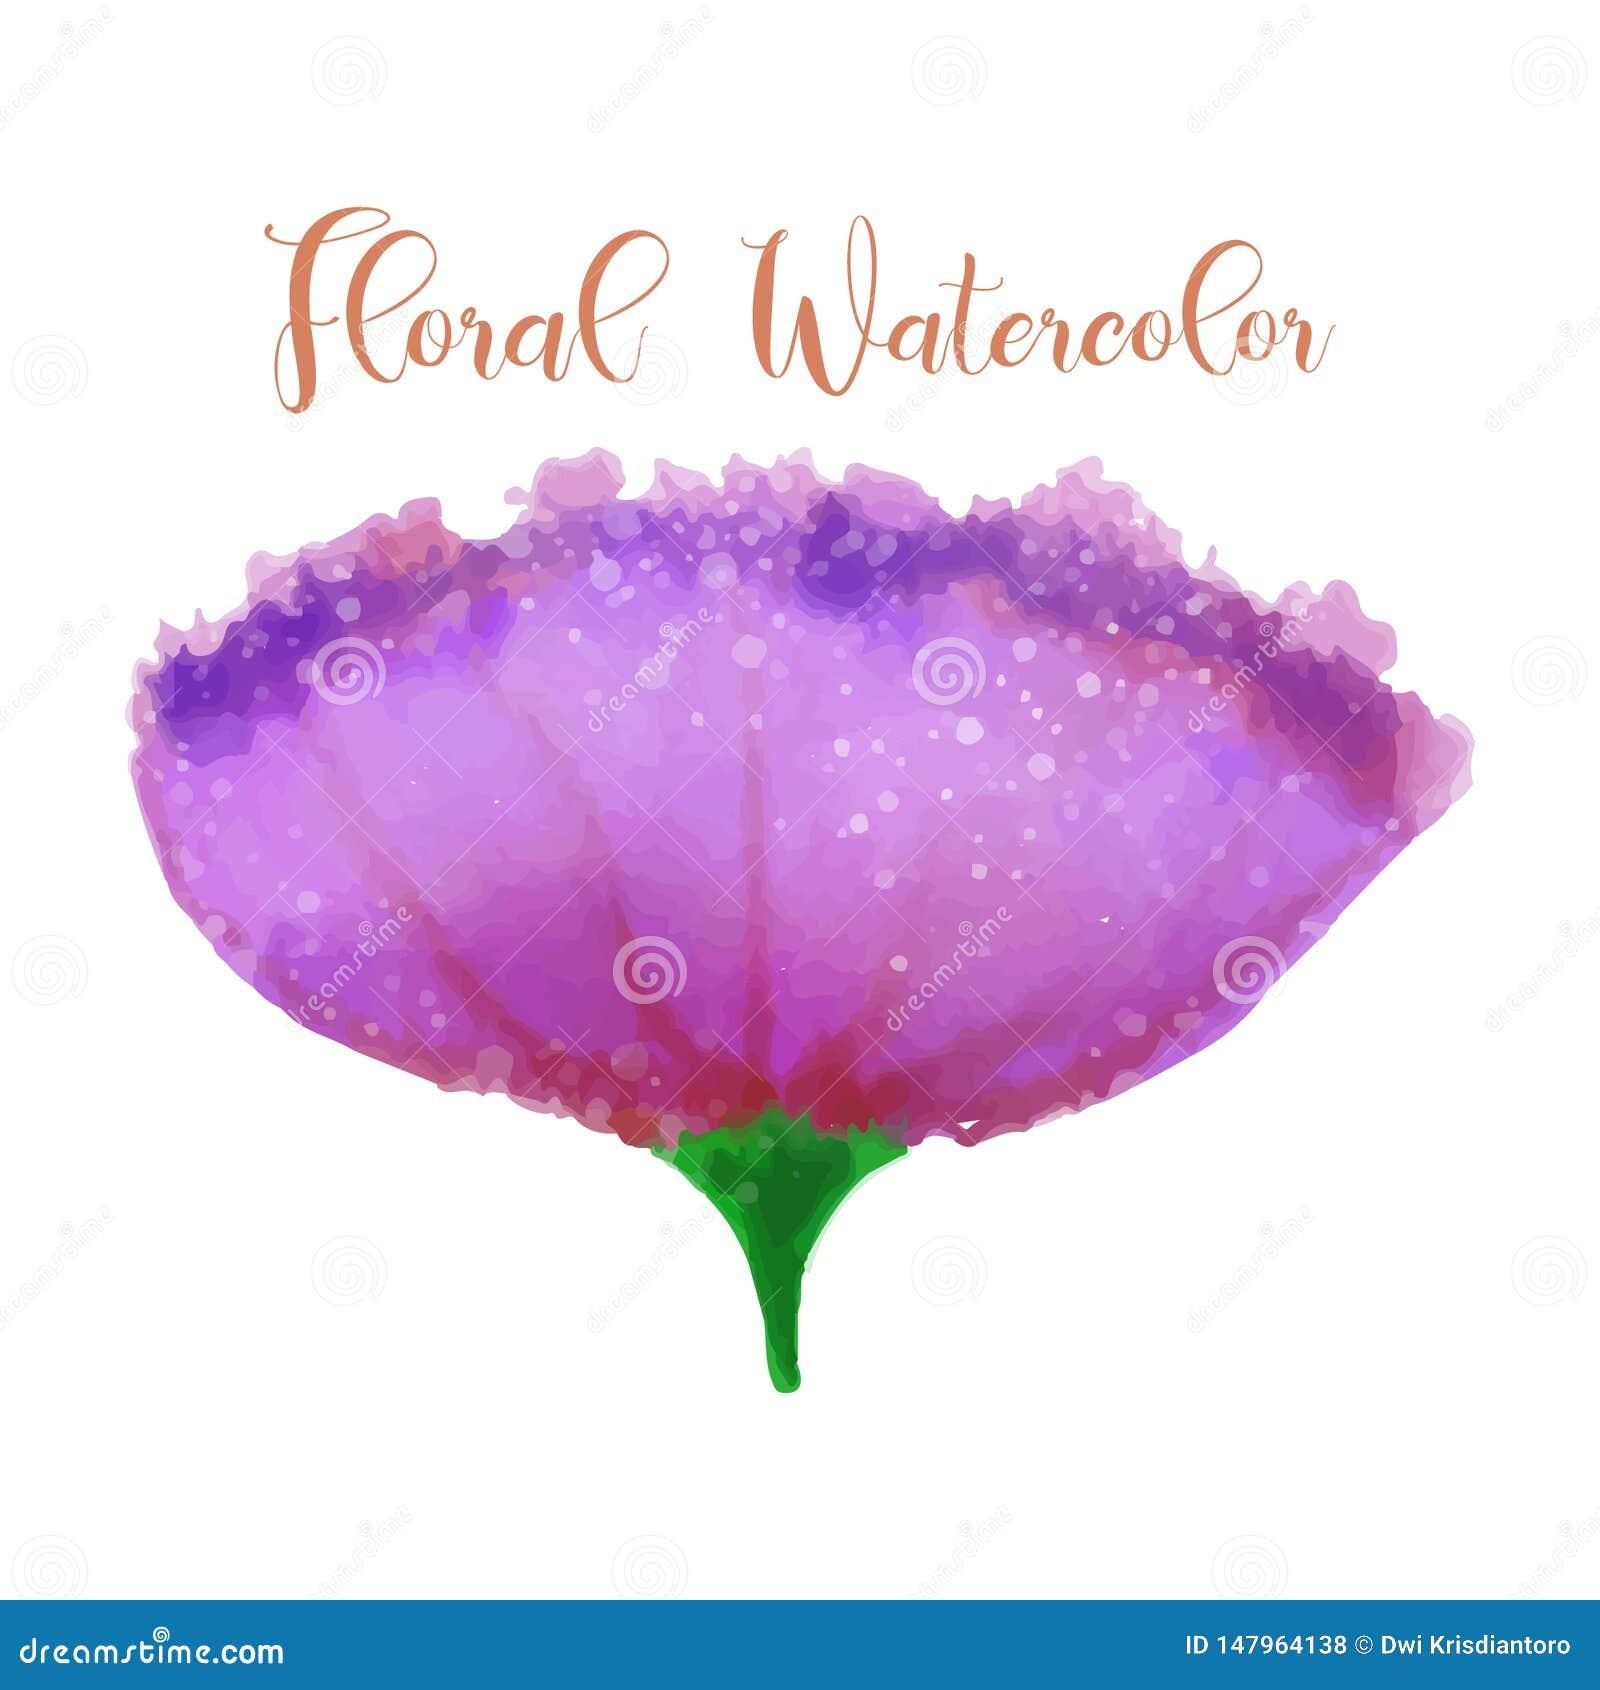 Flower watercolor design element. Watercolor floral vector art